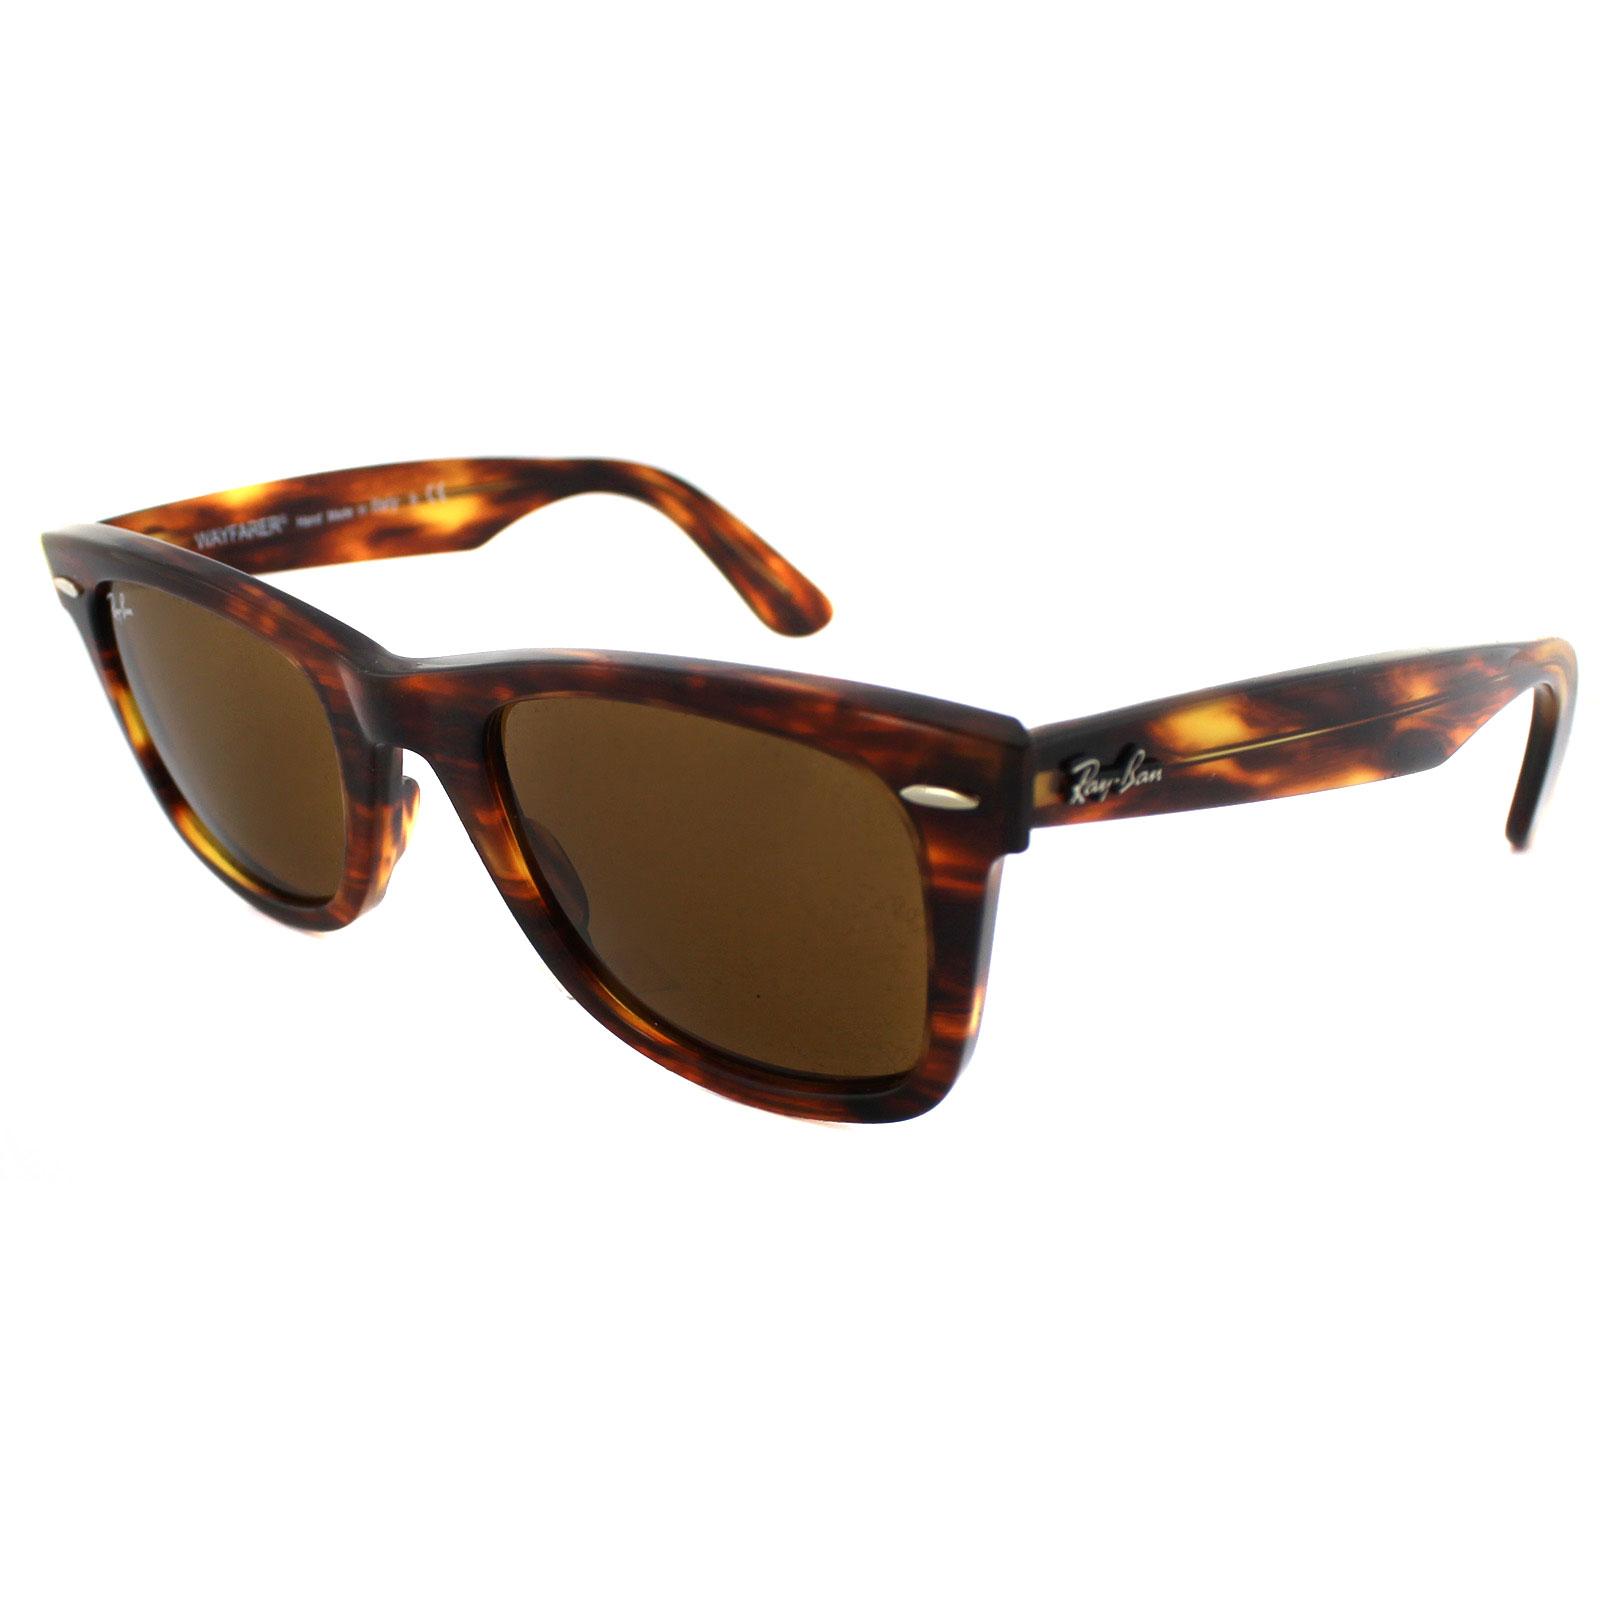 ray ban sunglasses wayfarer 2140 954 light tortoise brown medium 50mm ebay. Black Bedroom Furniture Sets. Home Design Ideas